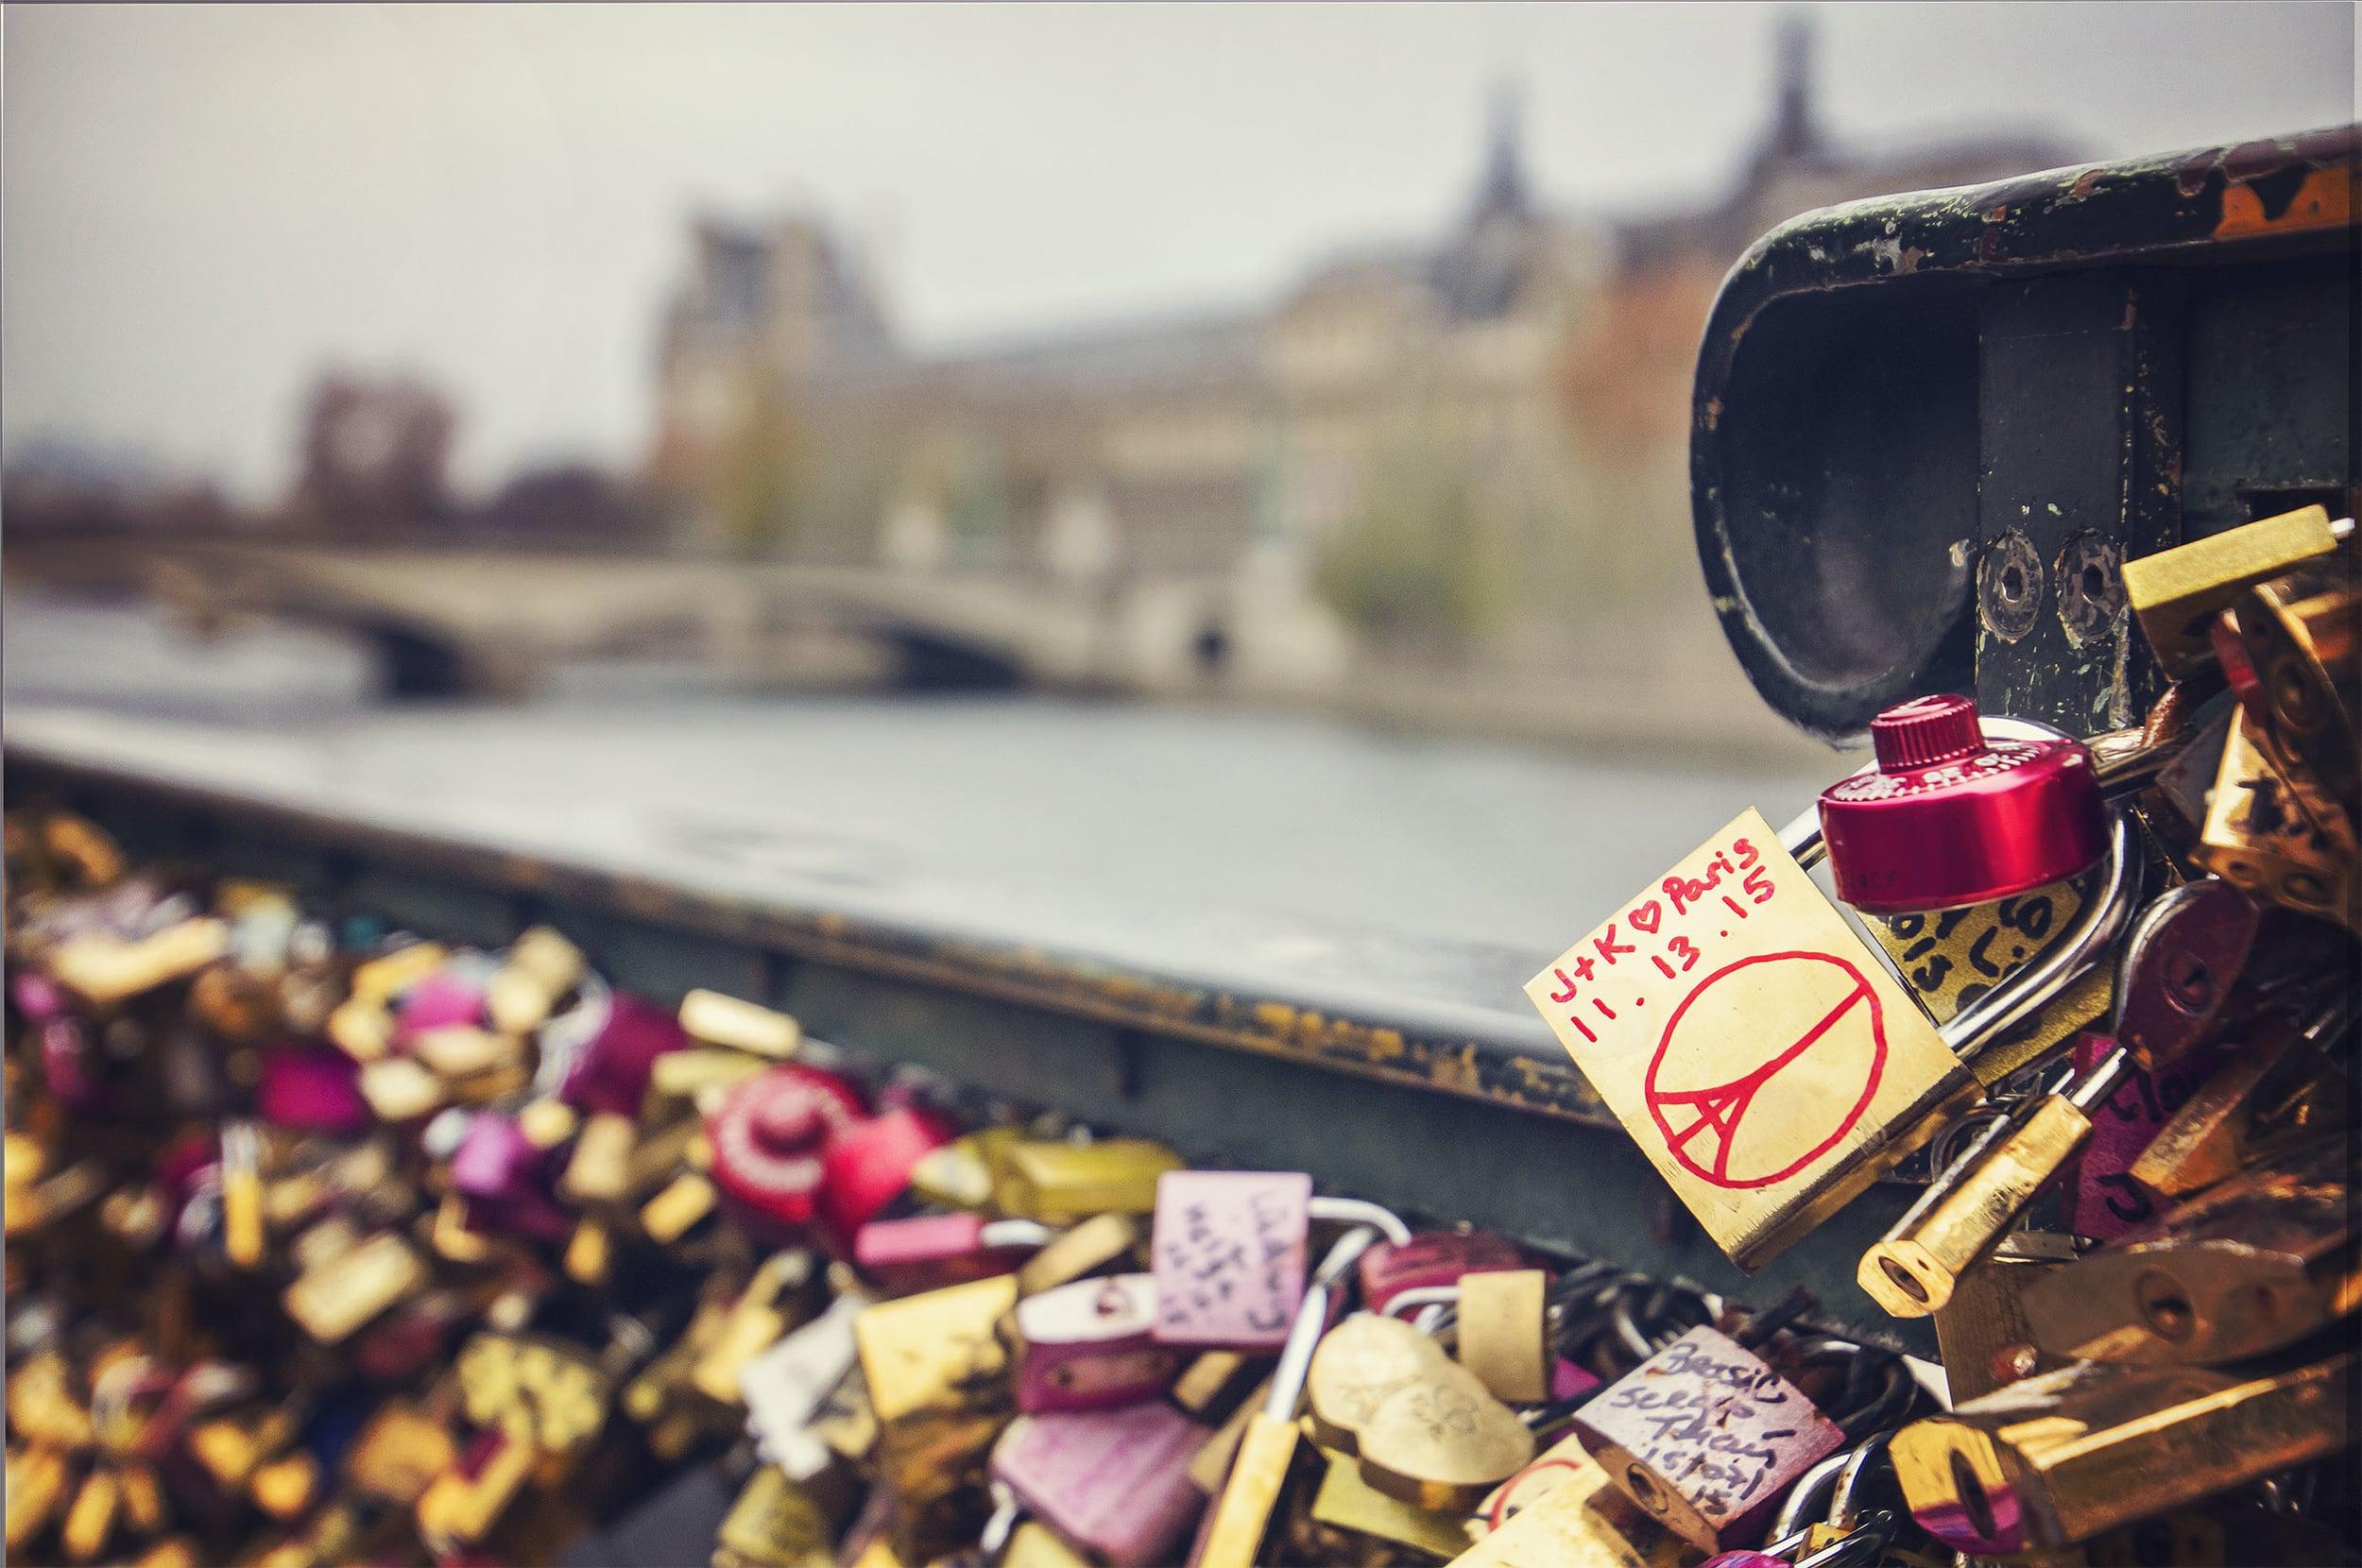 Paris_Lock_01-s.jpg